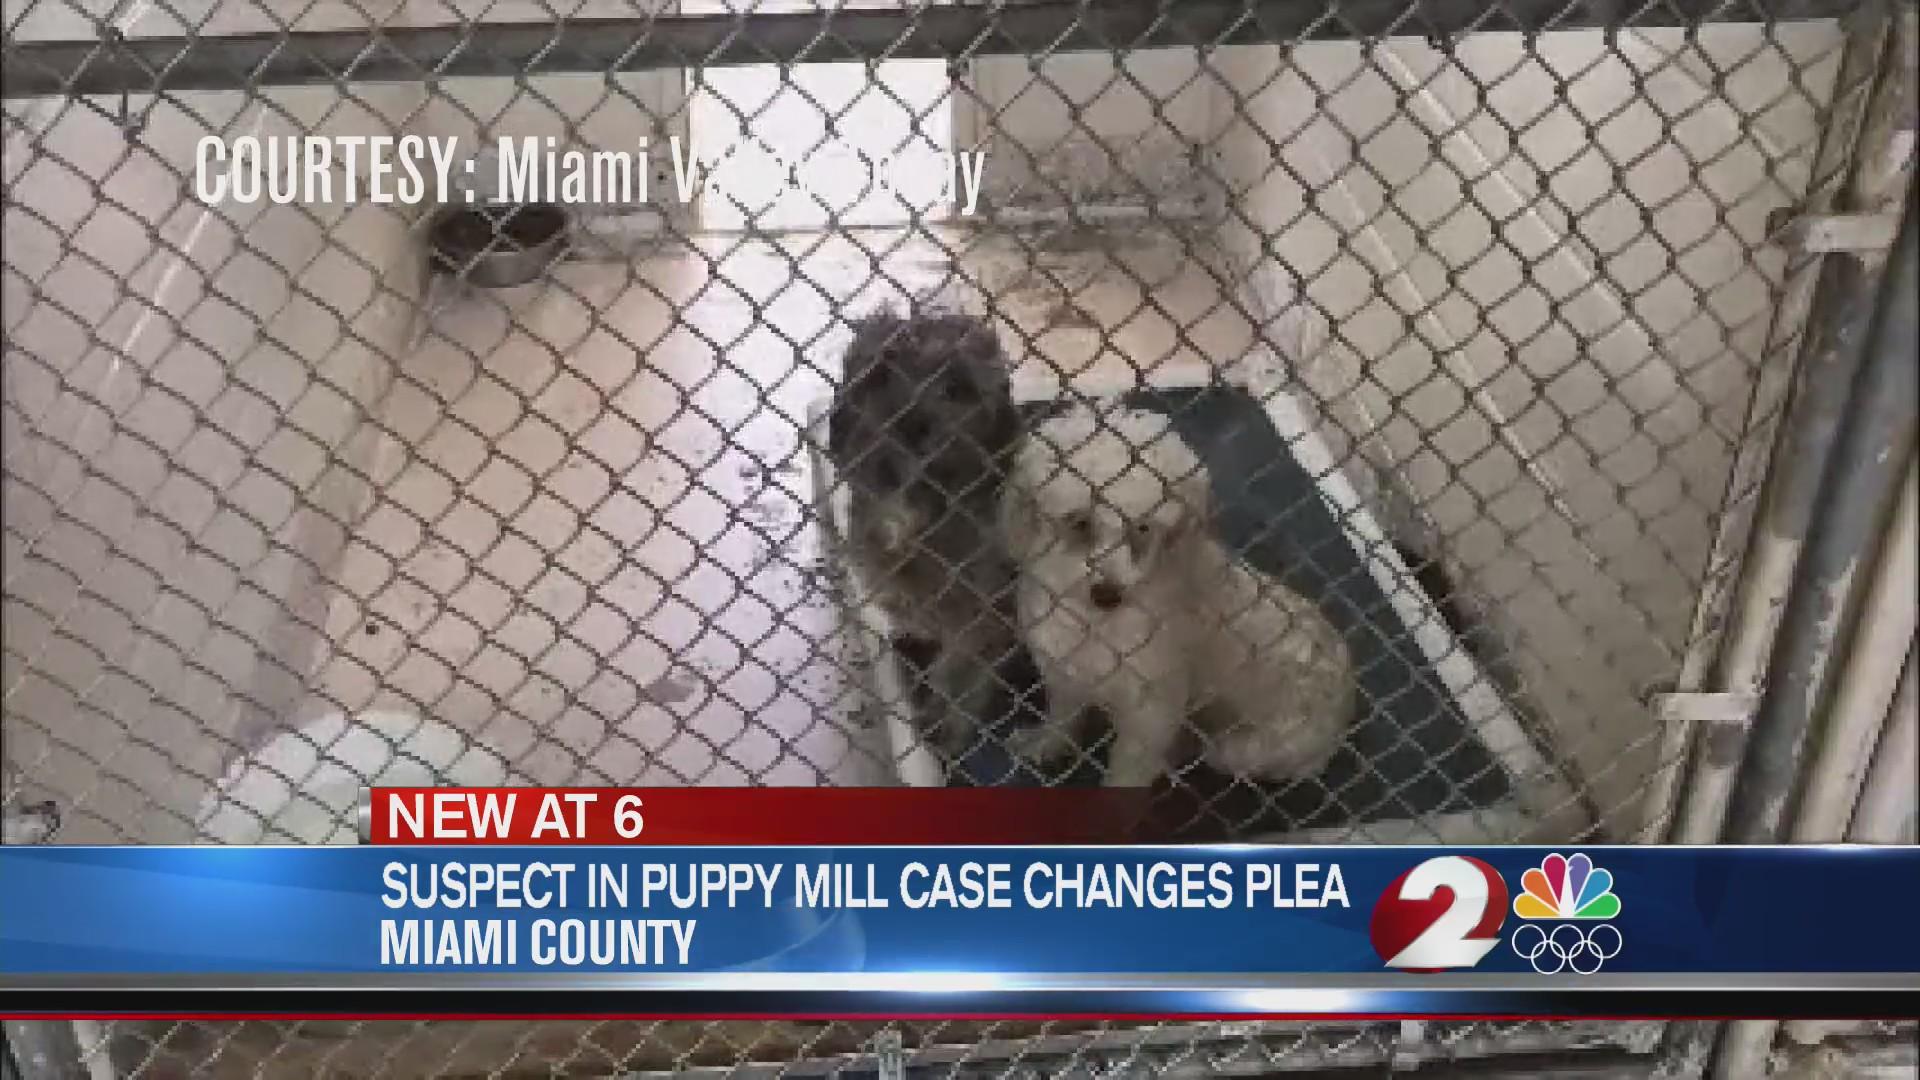 Suspect in puppy mill case changes plea